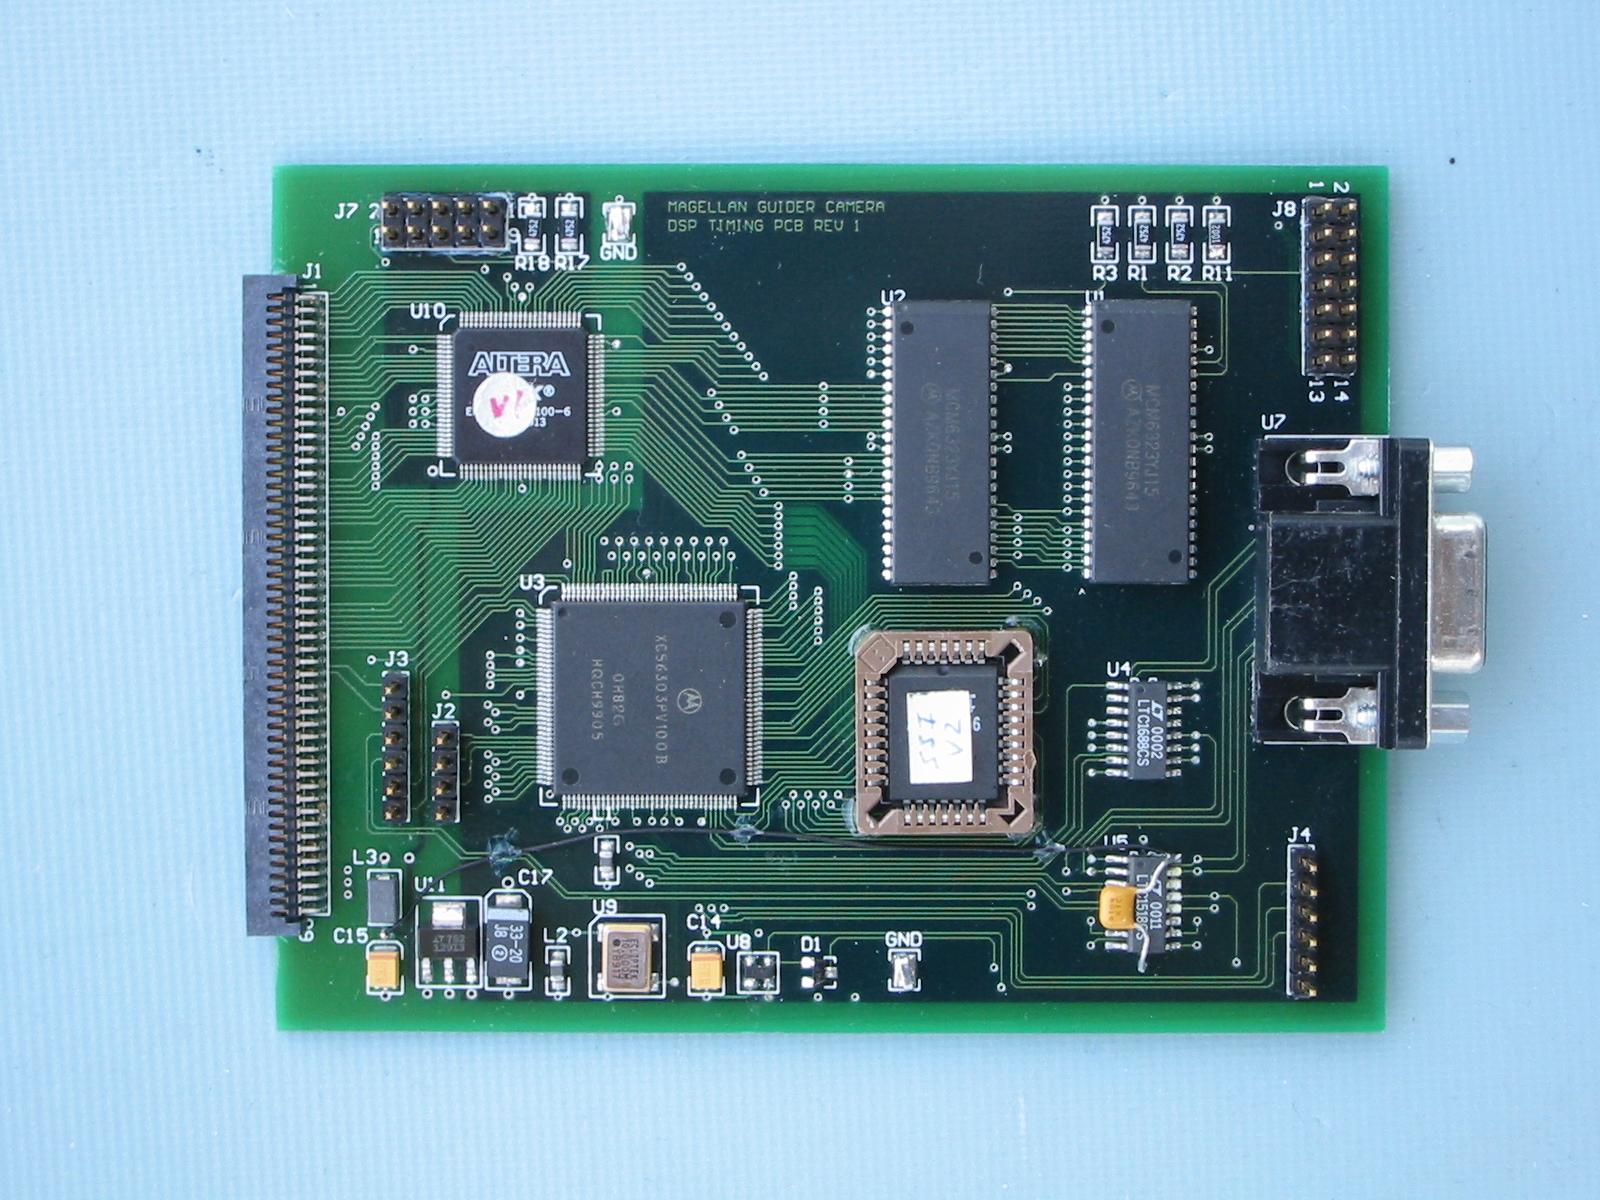 Magellan guider camera DSP description and timing generation